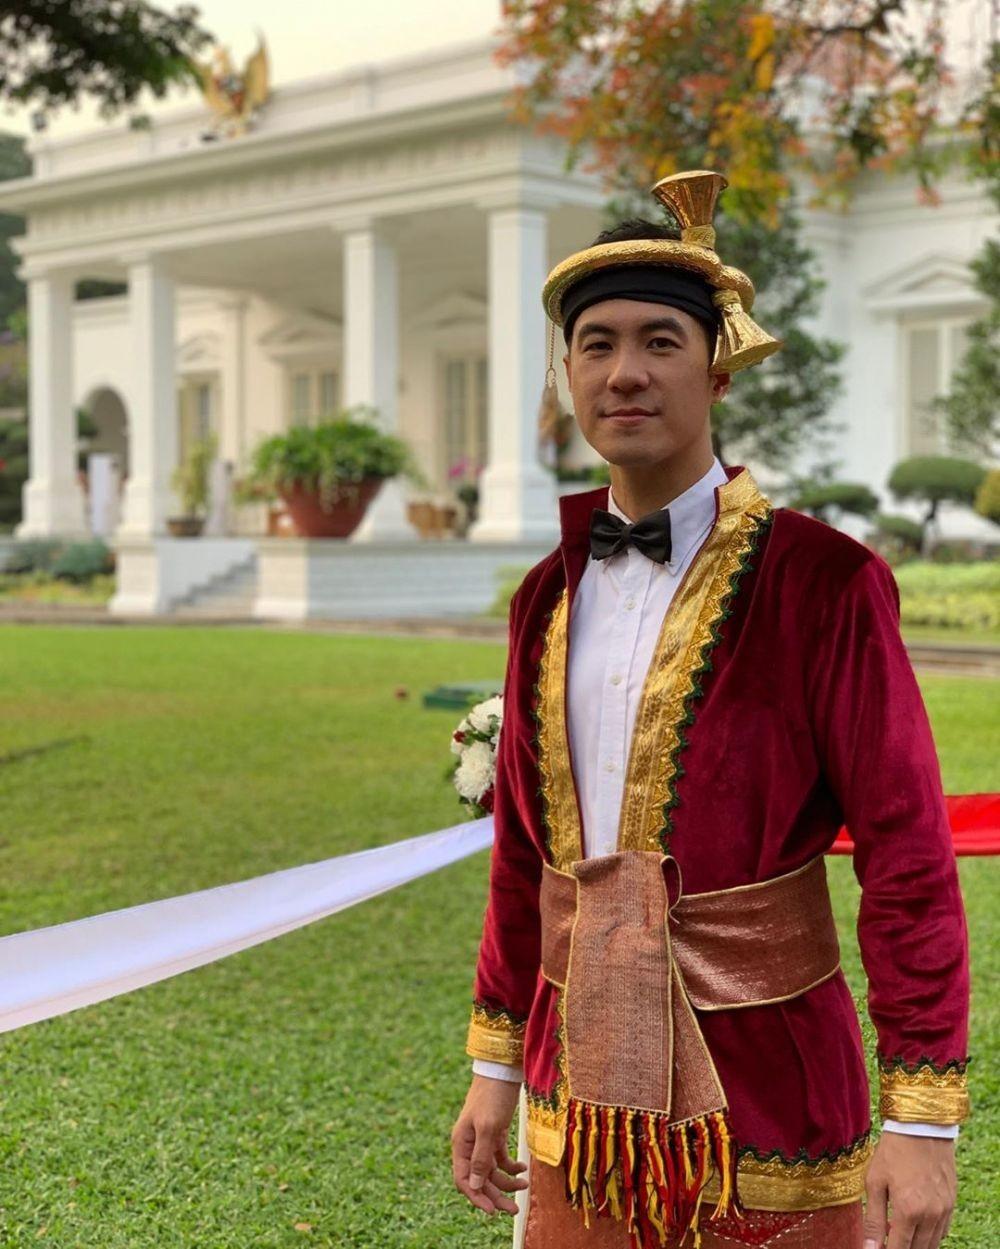 Kebaya sampai Baju Adat, 11 Style Kece Publik Figur di Istana Merdeka